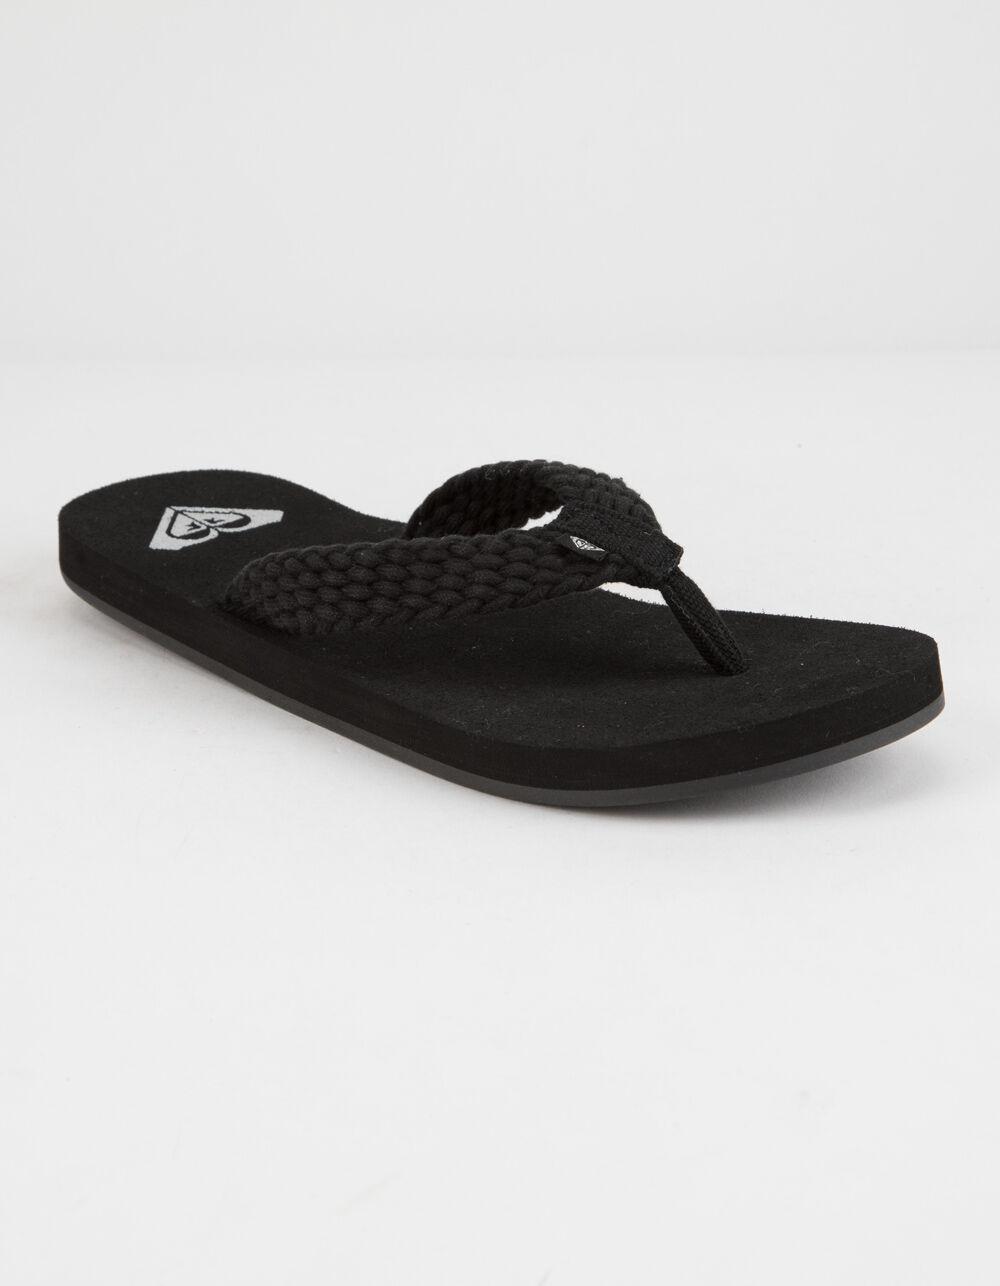 ROXY Porto II Sandals